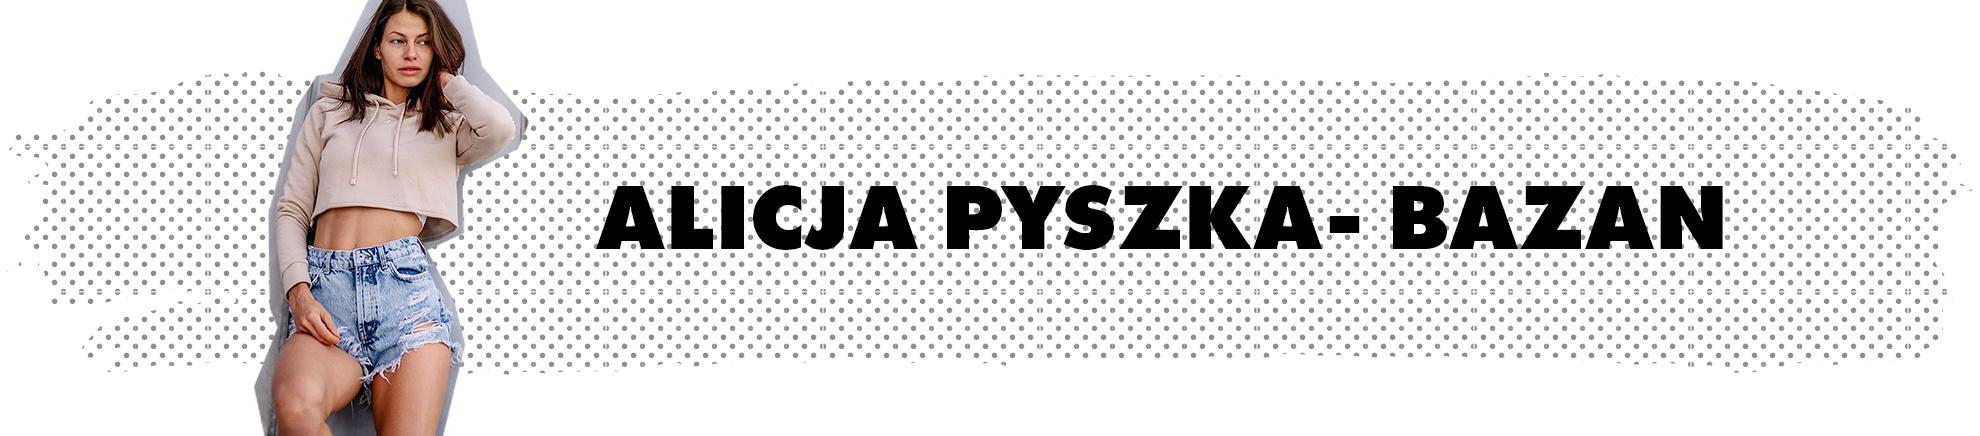 Alicja Pyszka-Bazan FitAla - ambasadorka marki Carpatree